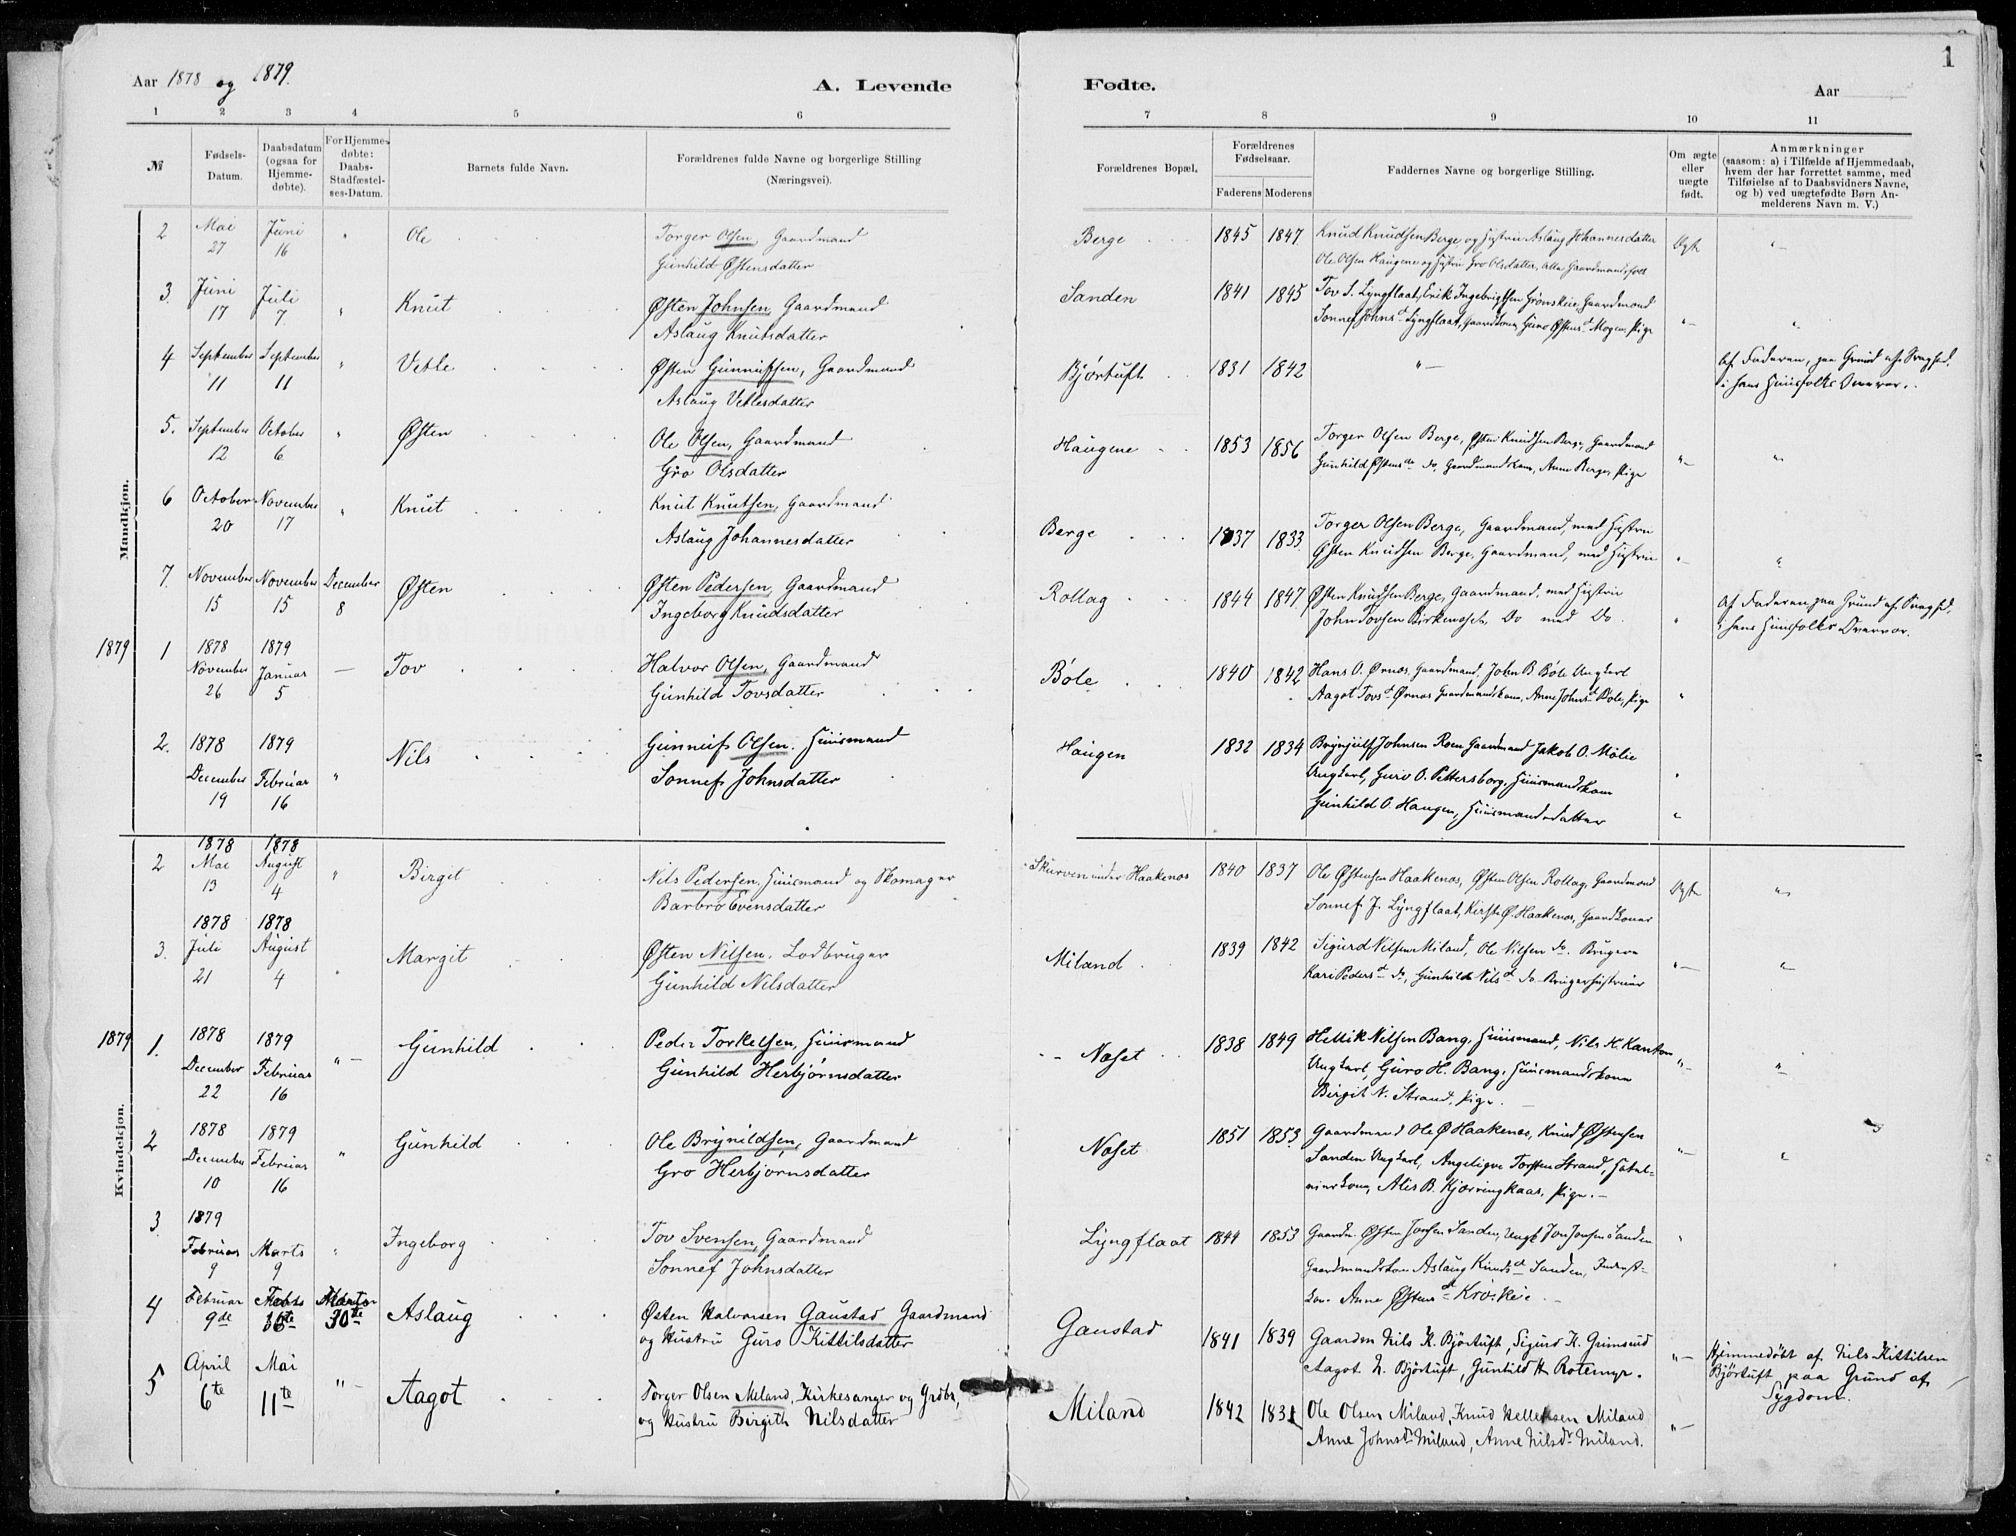 SAKO, Tinn kirkebøker, F/Fb/L0002: Ministerialbok nr. II 2, 1878-1917, s. 1